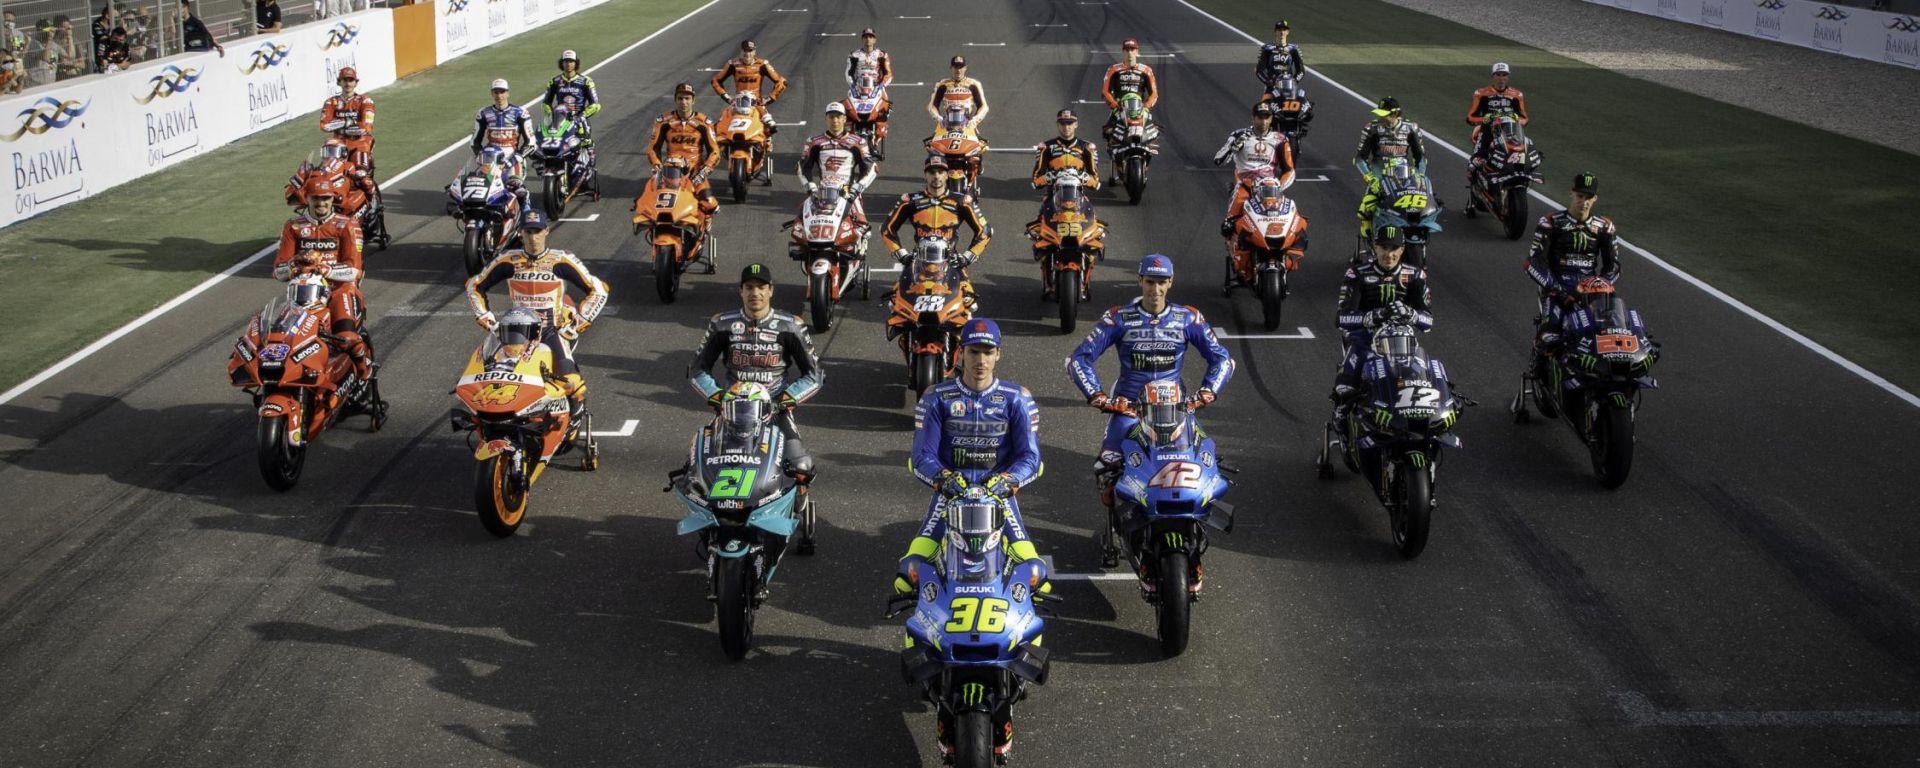 Tutti i piloti MotoGP 2021 in griglia a Losail